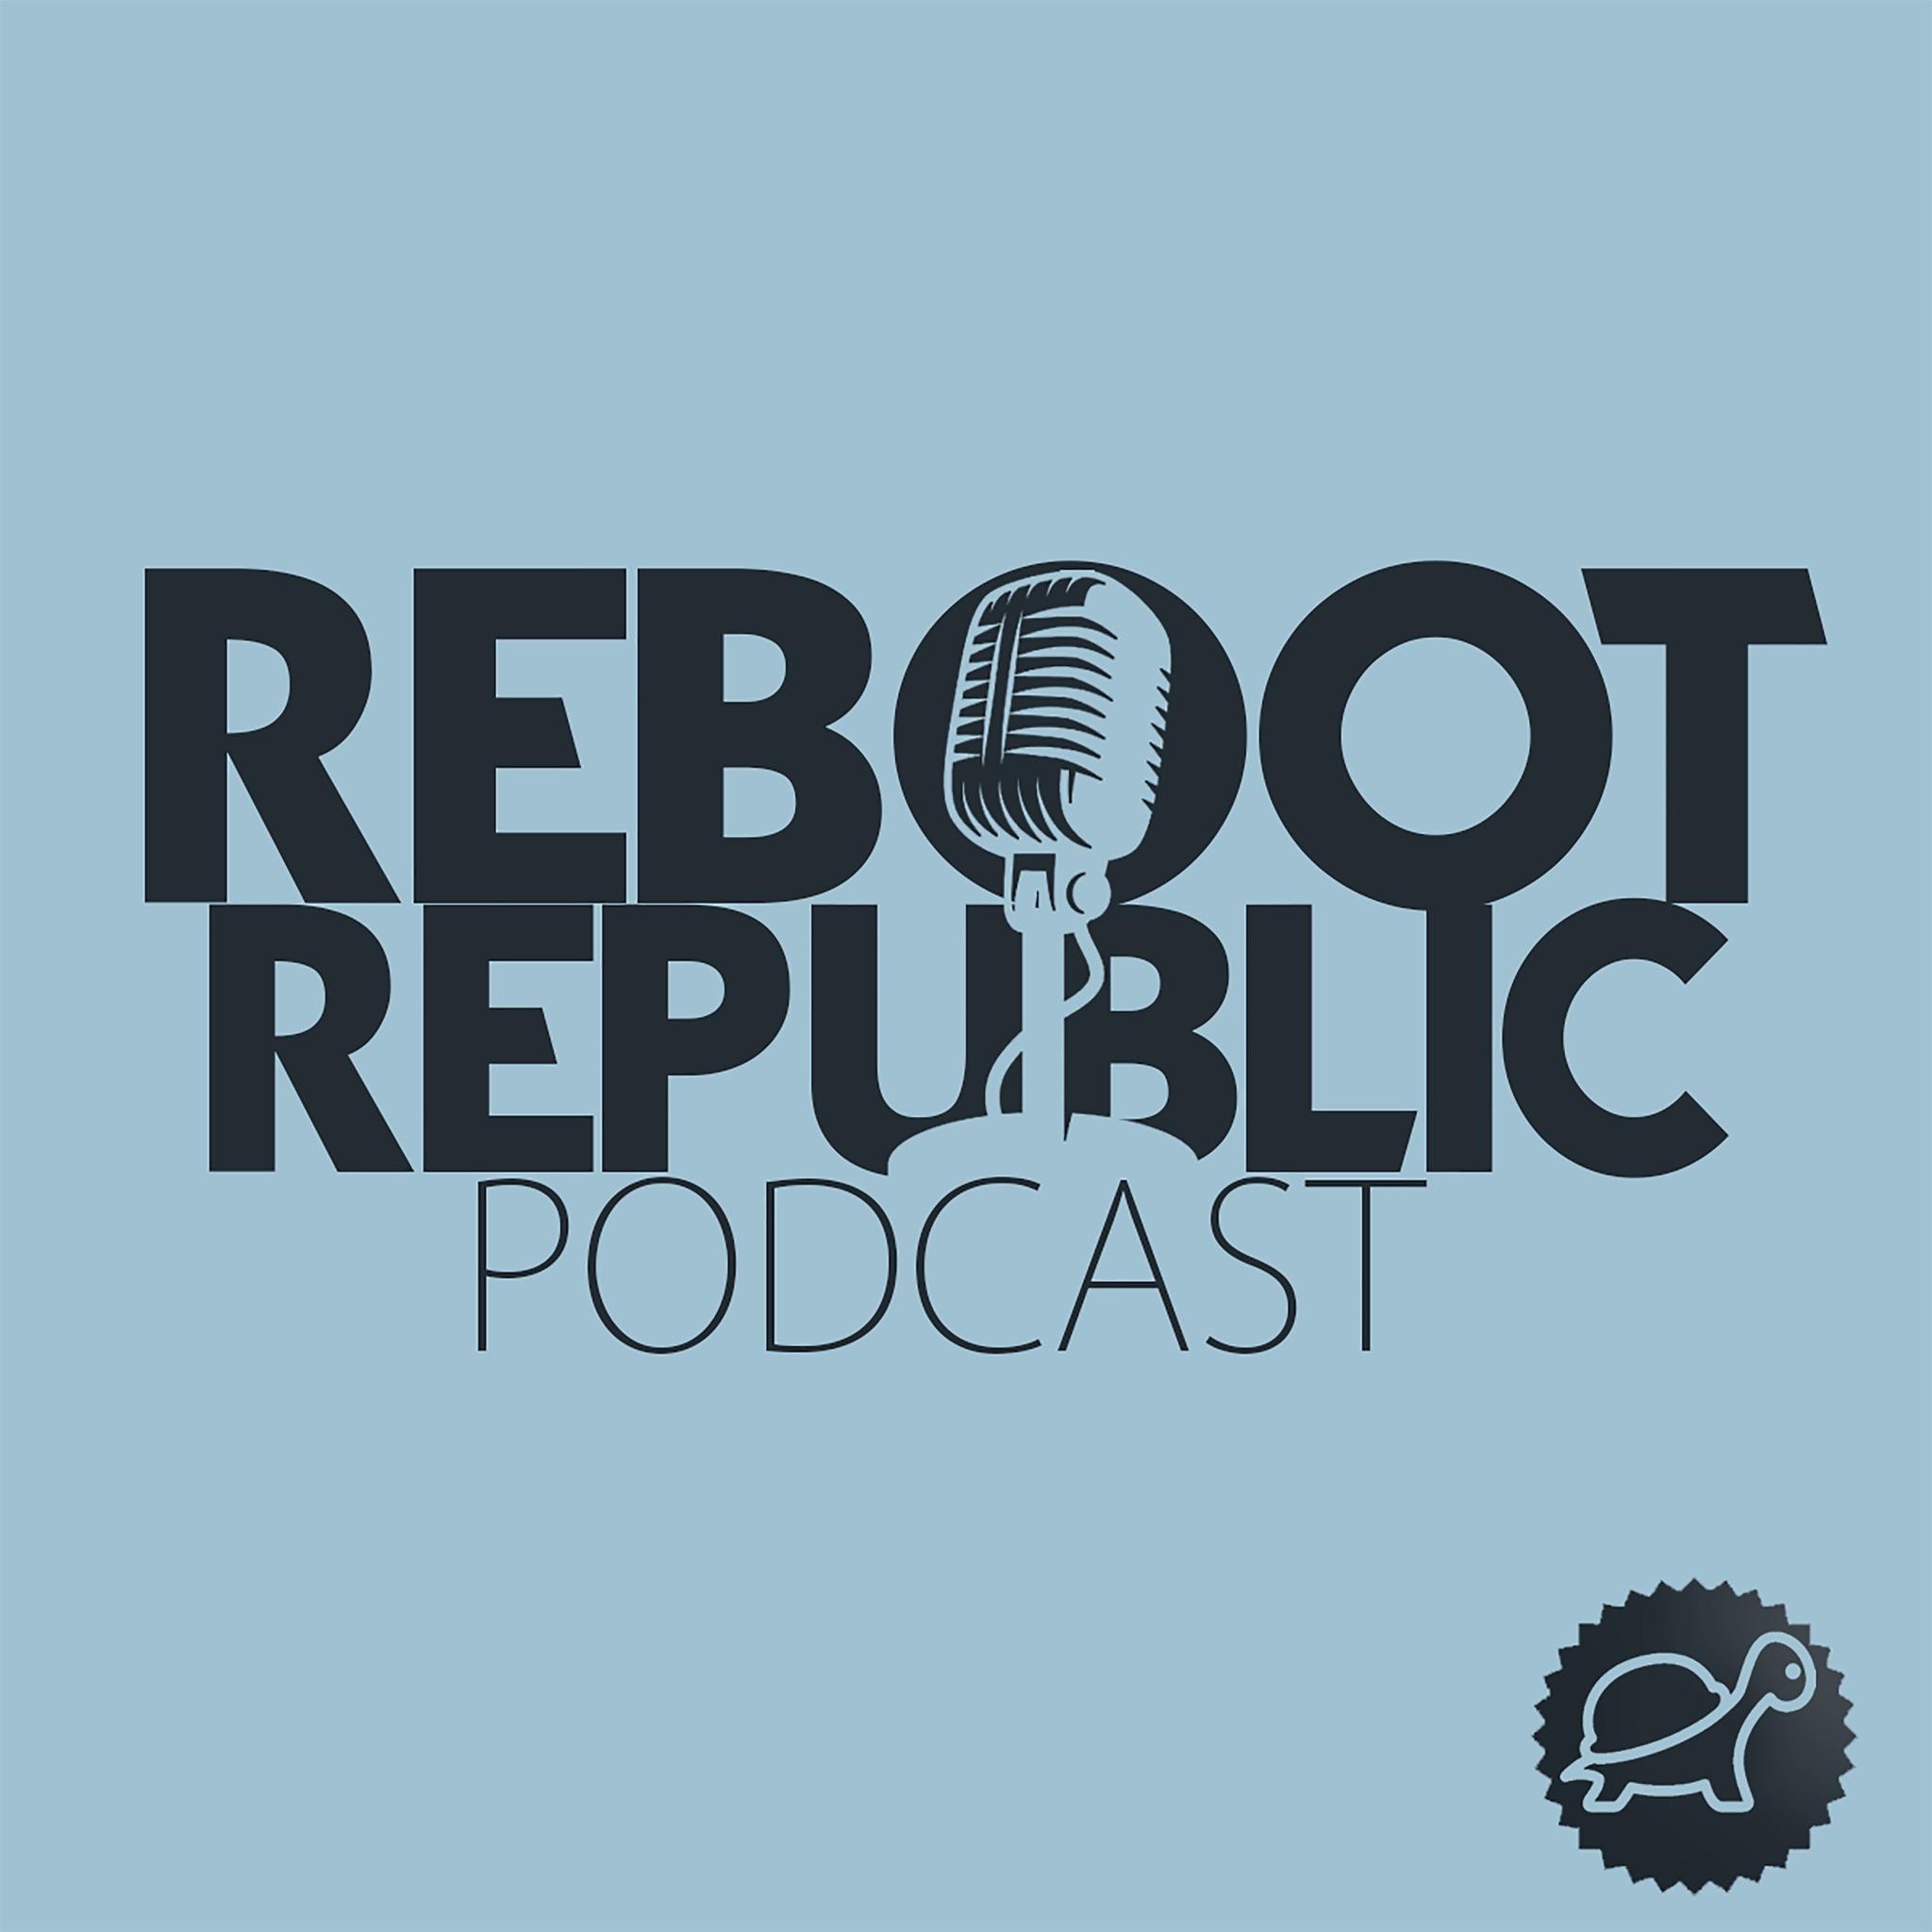 Reboot Republic Podcast